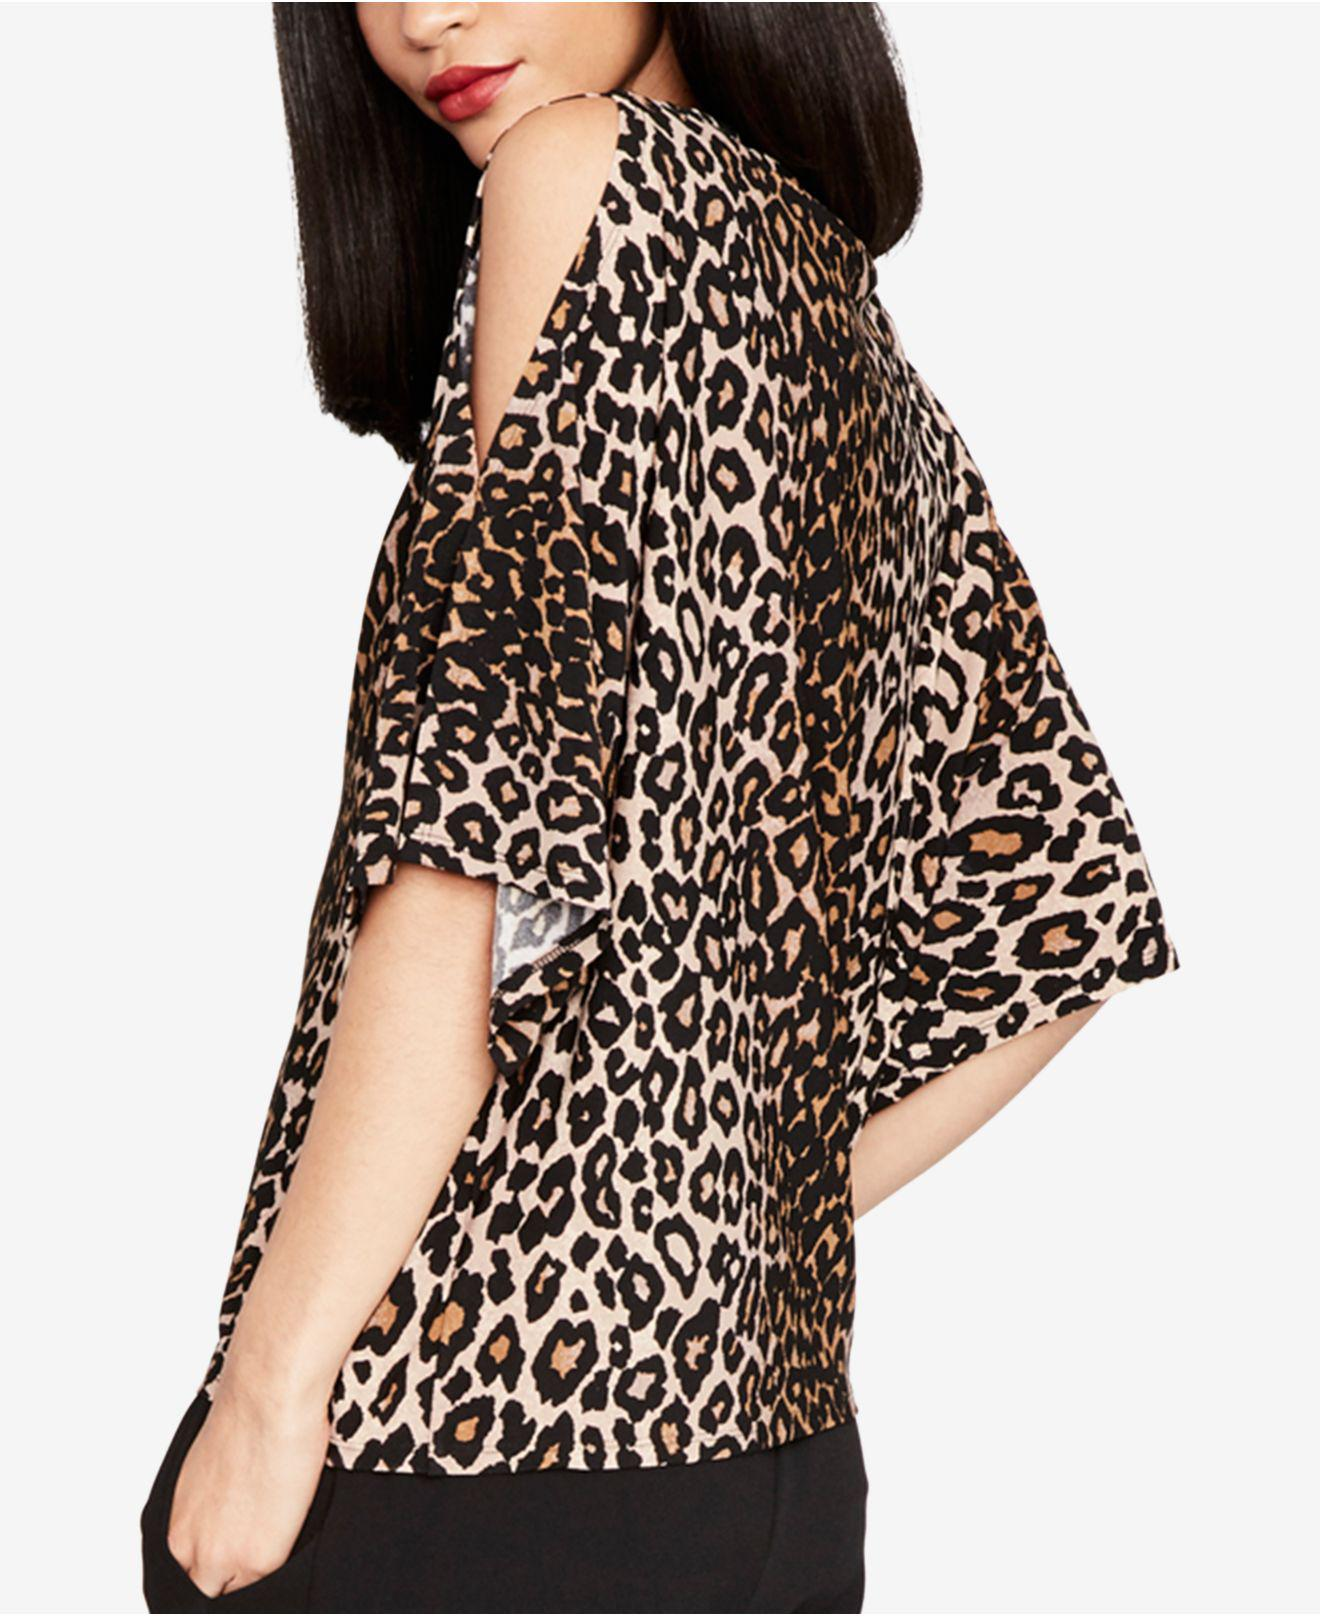 db8c8b34f952a Lyst - Rachel Rachel Roy Leopard-print Cold-shoulder Top in Black